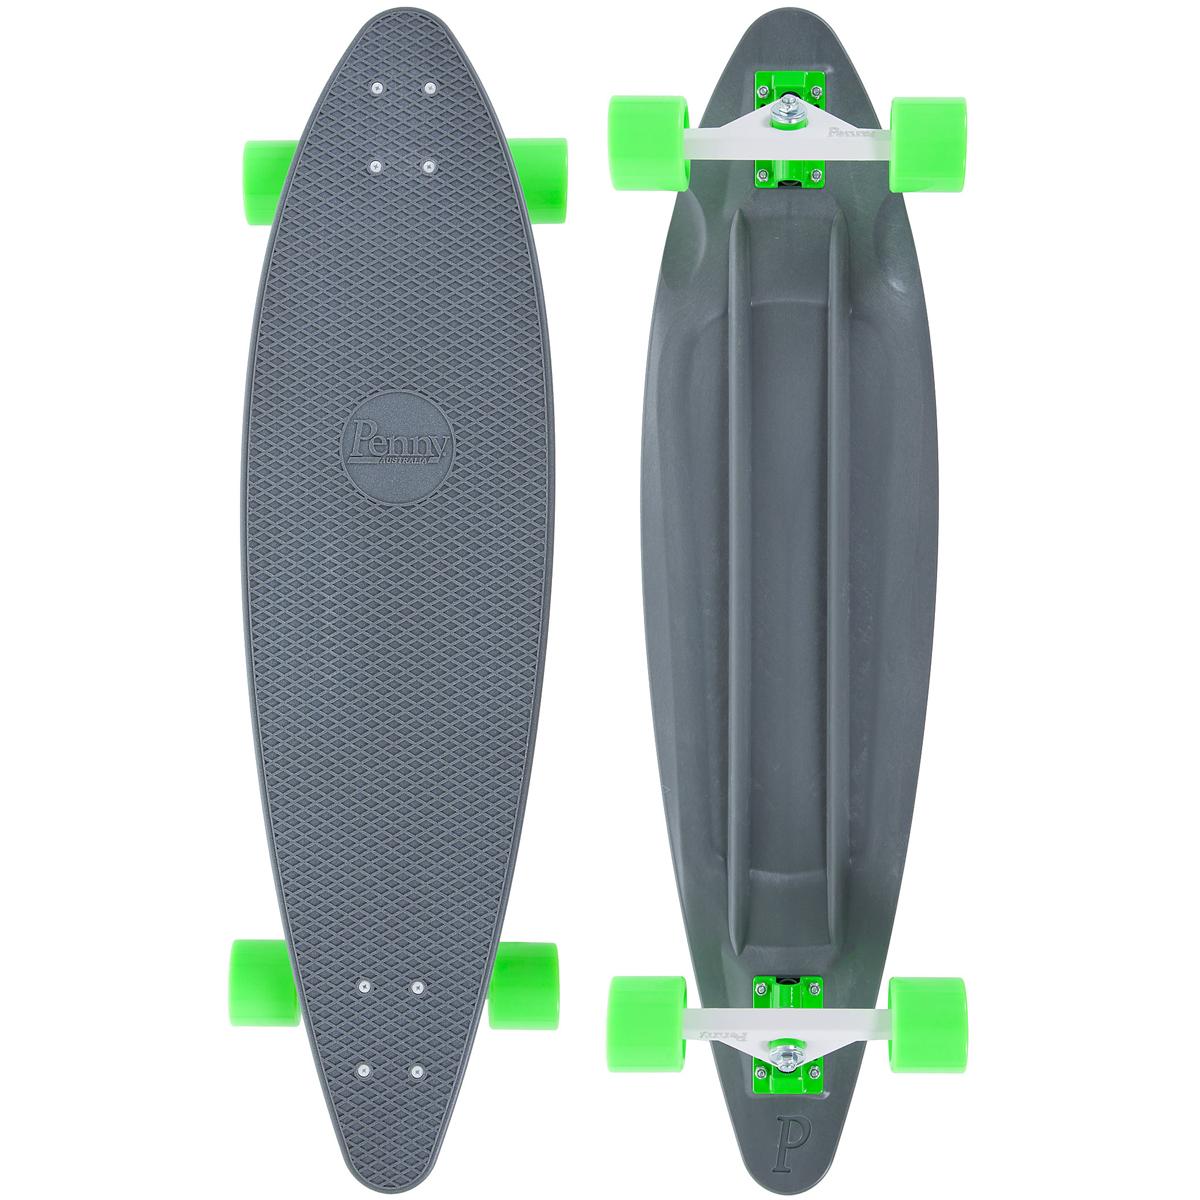 Лонгборд Penny Longboard 36, цвет: серый, зеленый, дека 91,4 х 24,5 см скейтборды penny комплект лонгборд original 22 ss